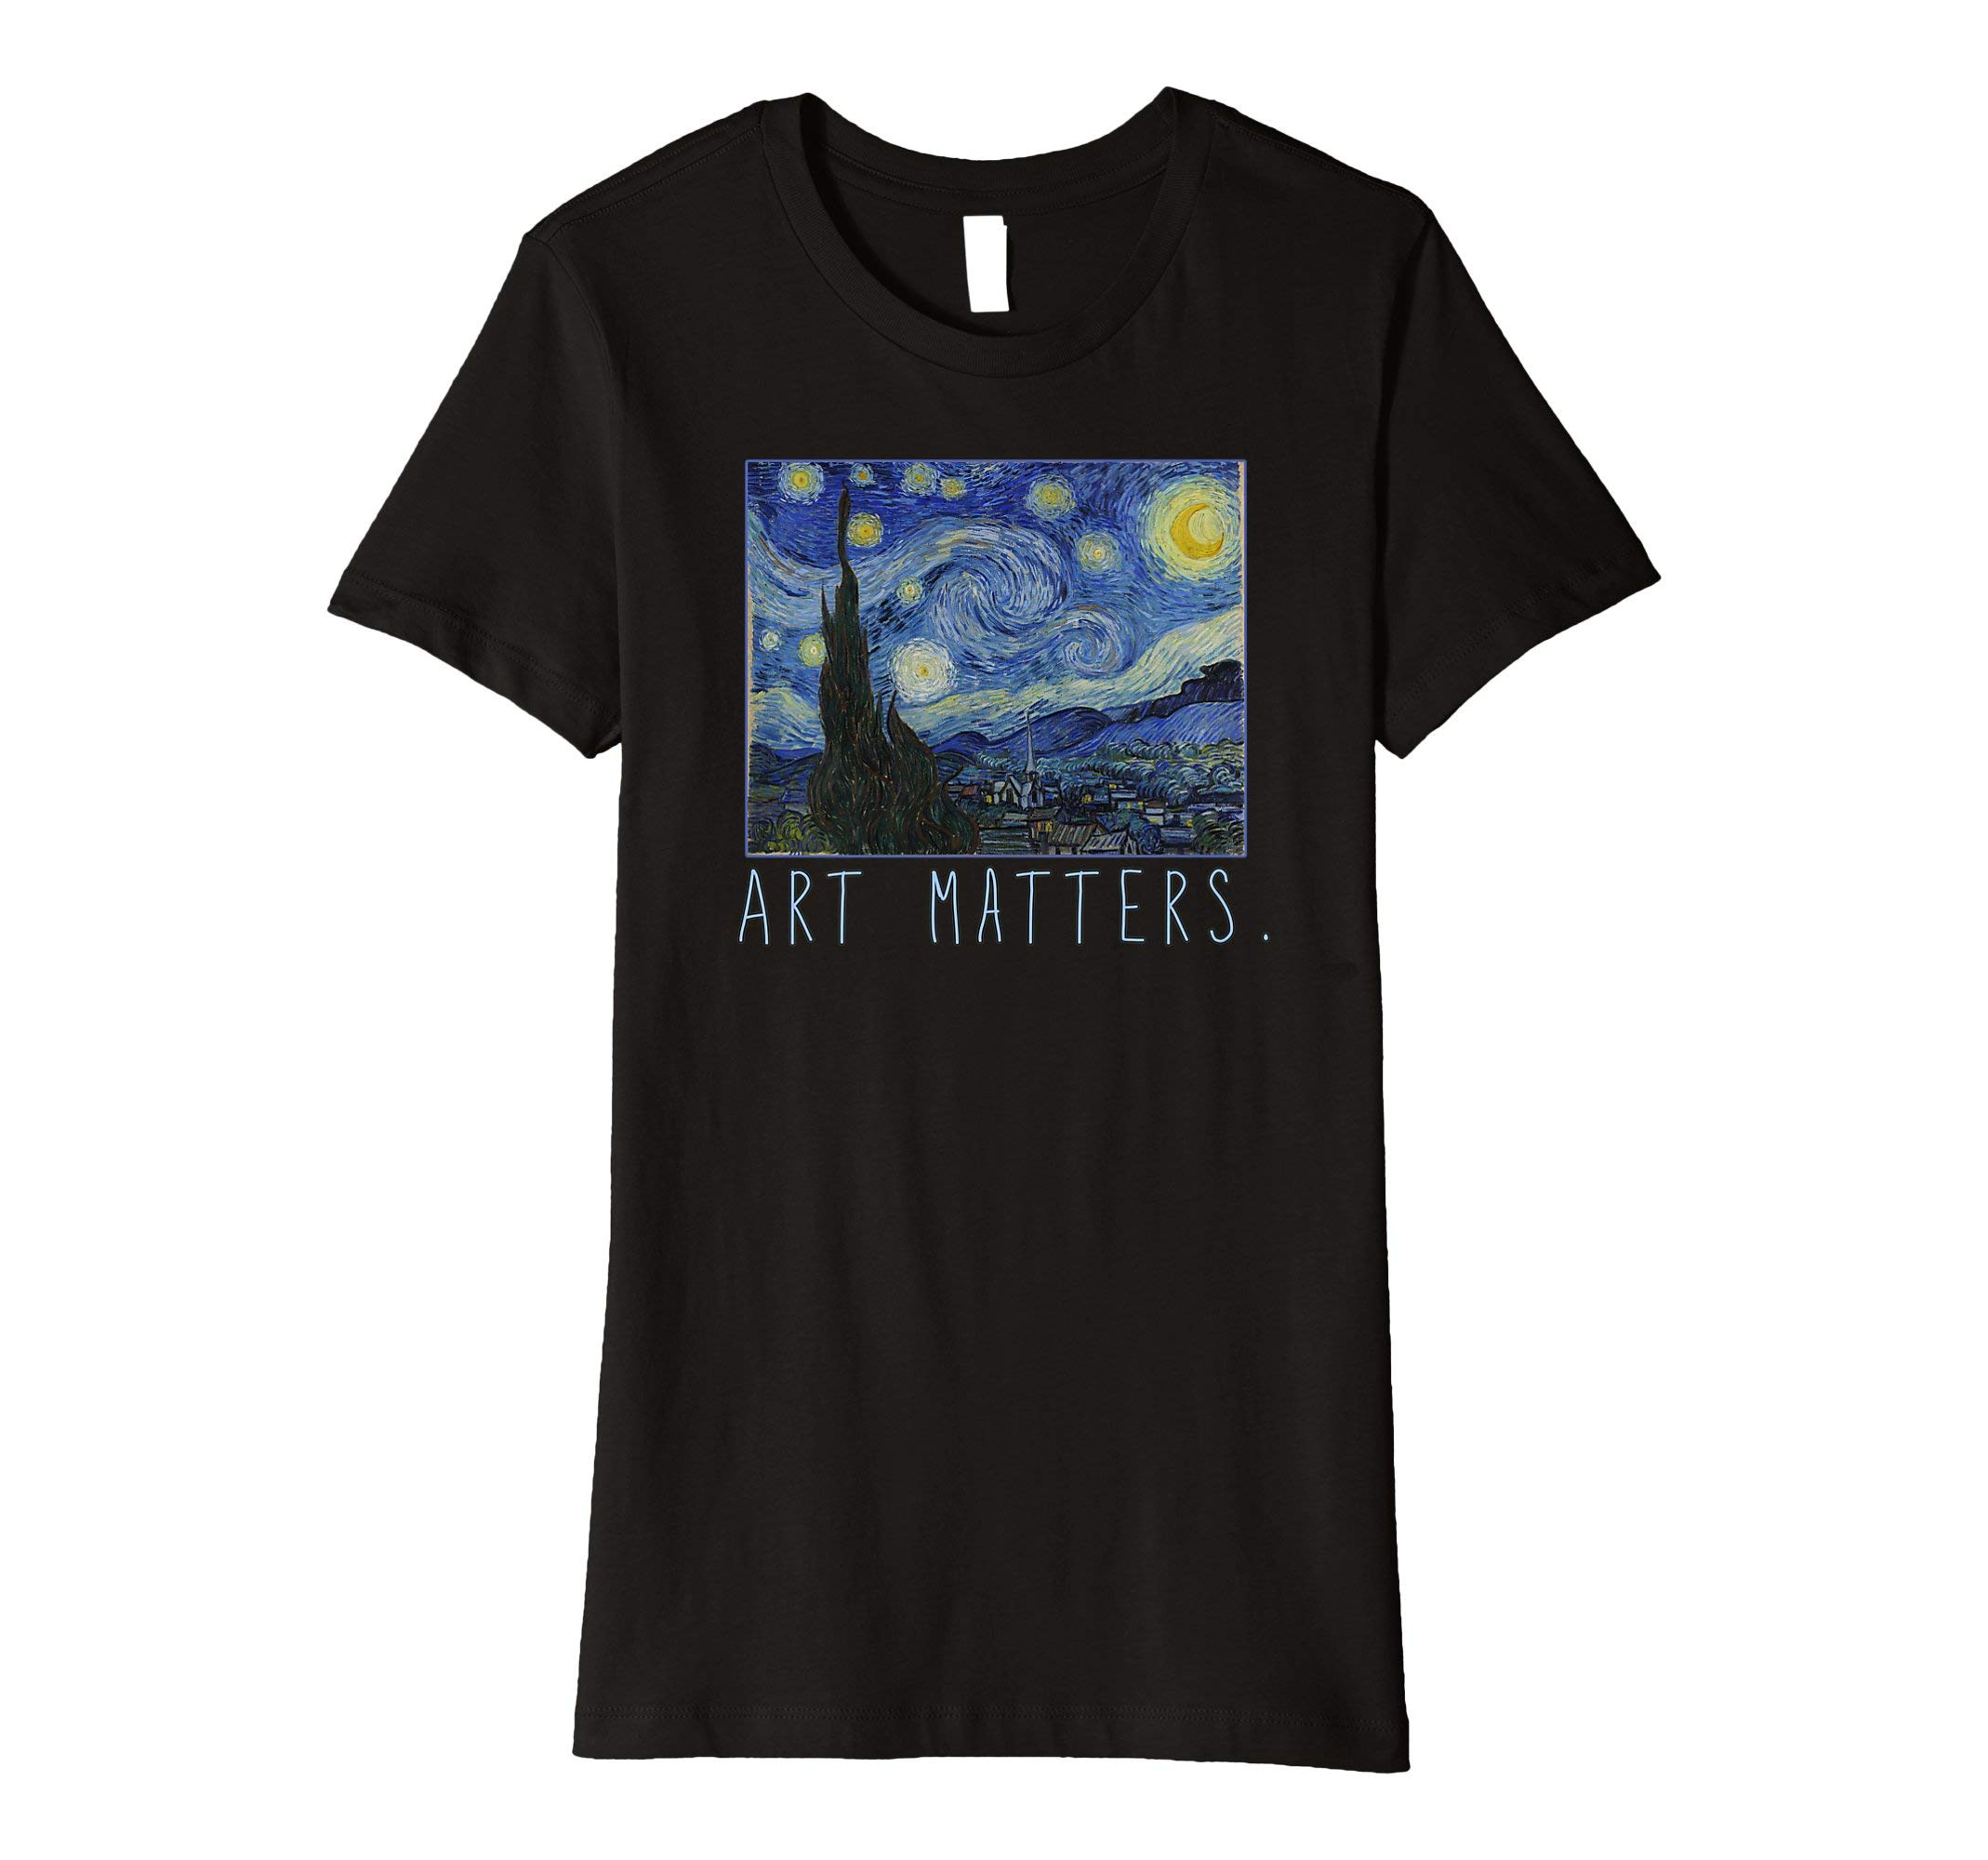 Womens Van Gogh Starry Night T-shirt Art Matters Large Black